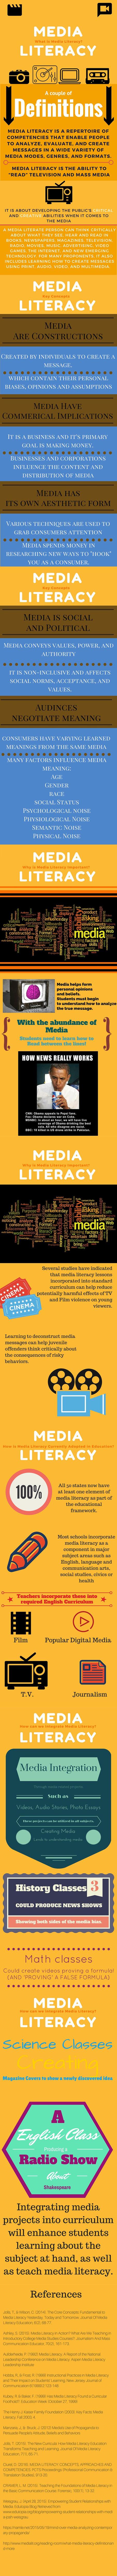 EdTech Media Literacy Infographic